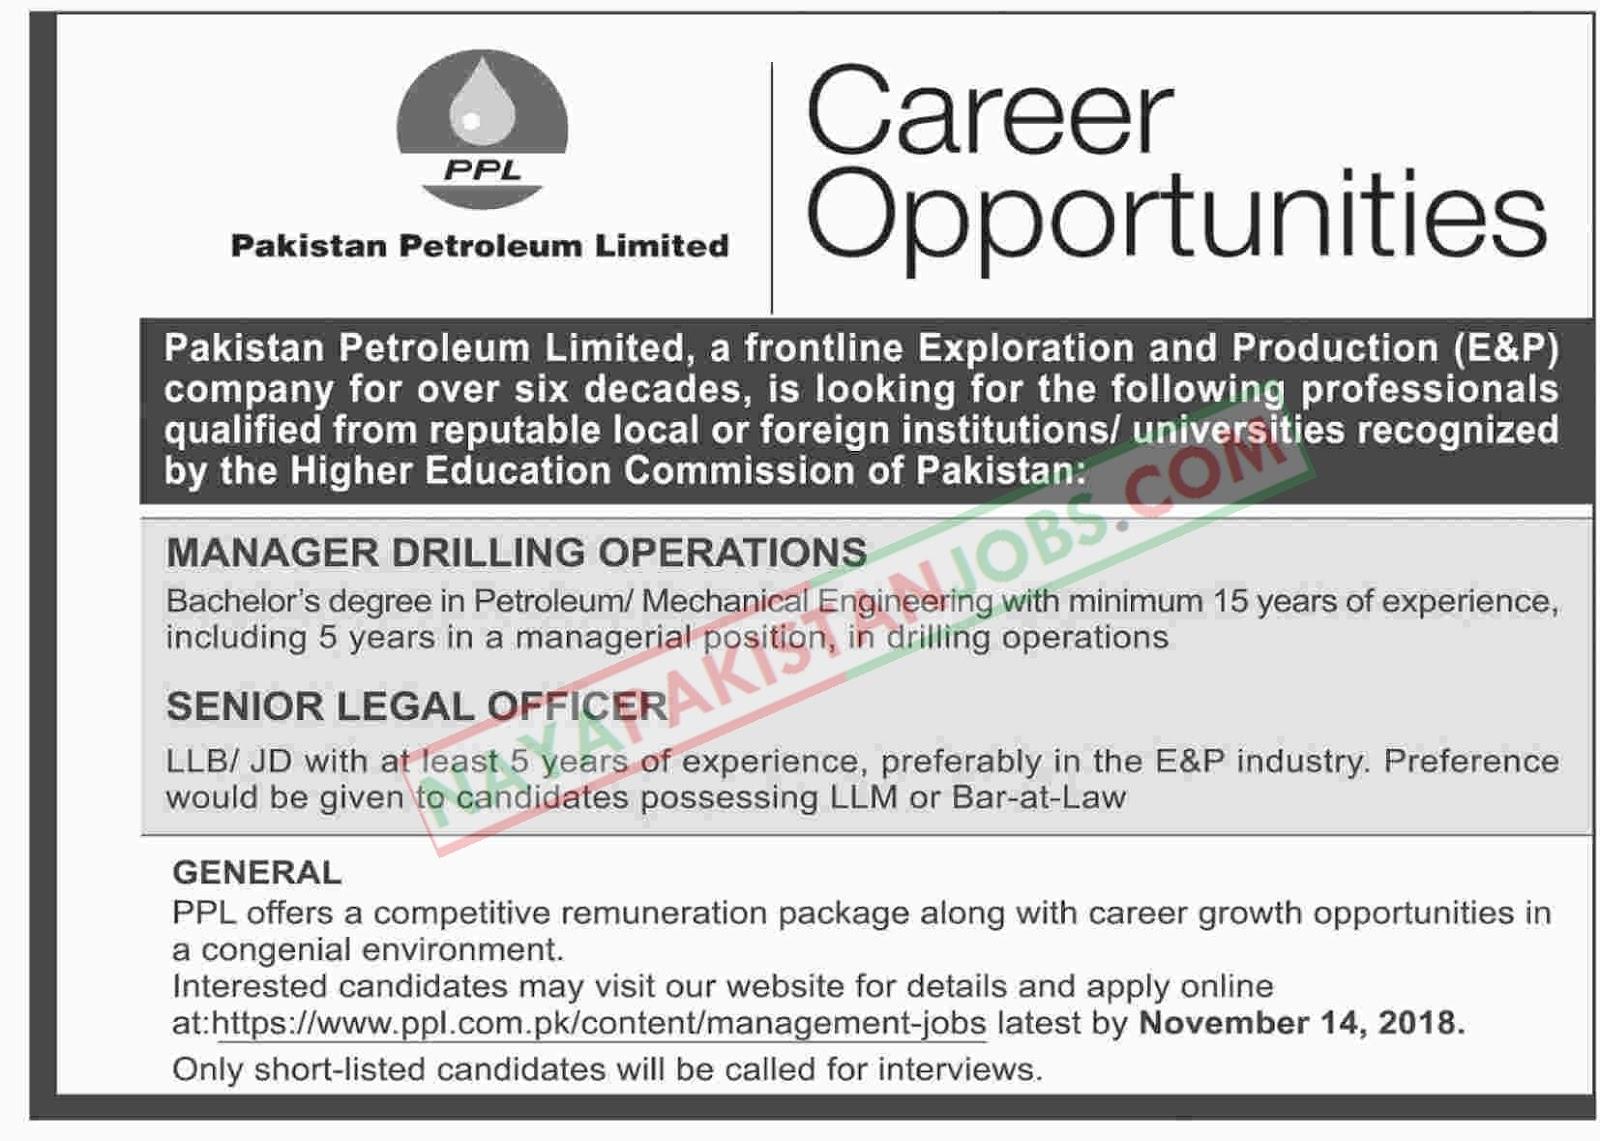 Latest Vacancies Announced in Pakistan Petroleum Limited PPL 5 November 2018 - Naya Pakistan